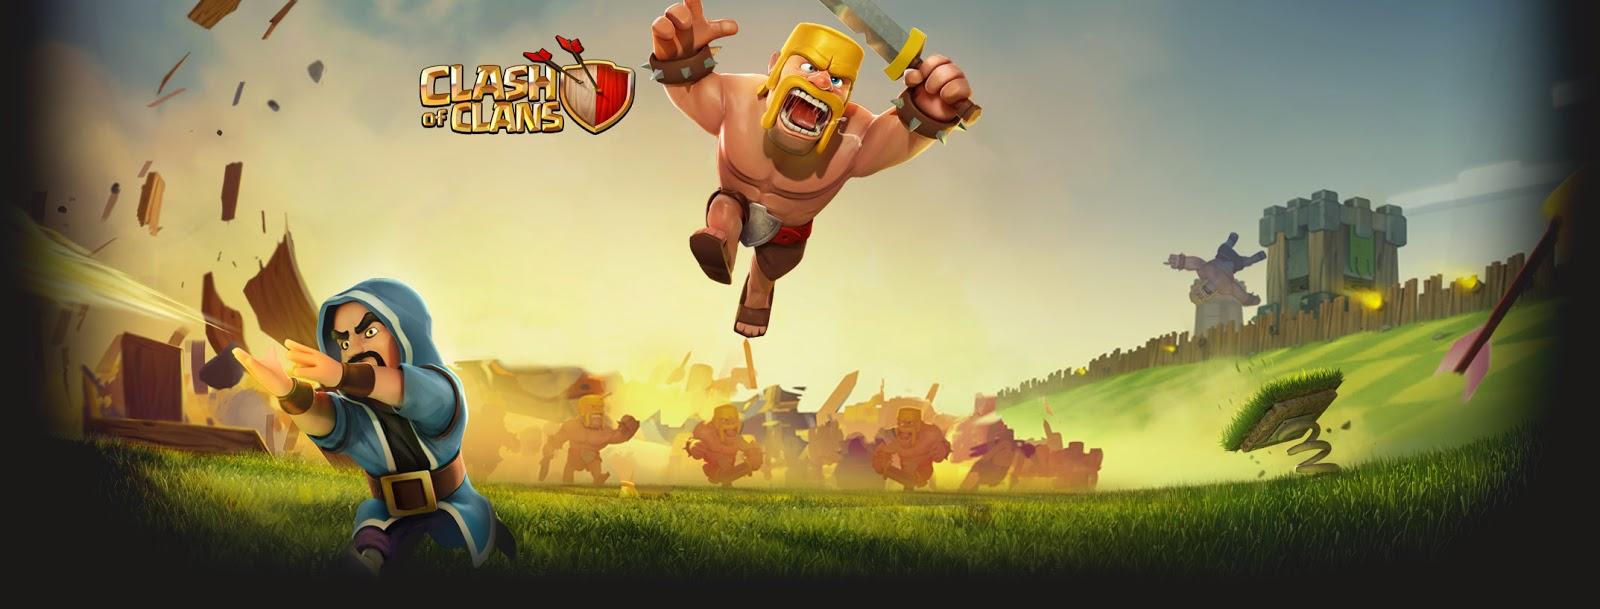 Barbarian Clash Of Clans Hd Hd Games 4k Wallpapers: Clash Of Clans HD Wallpapers